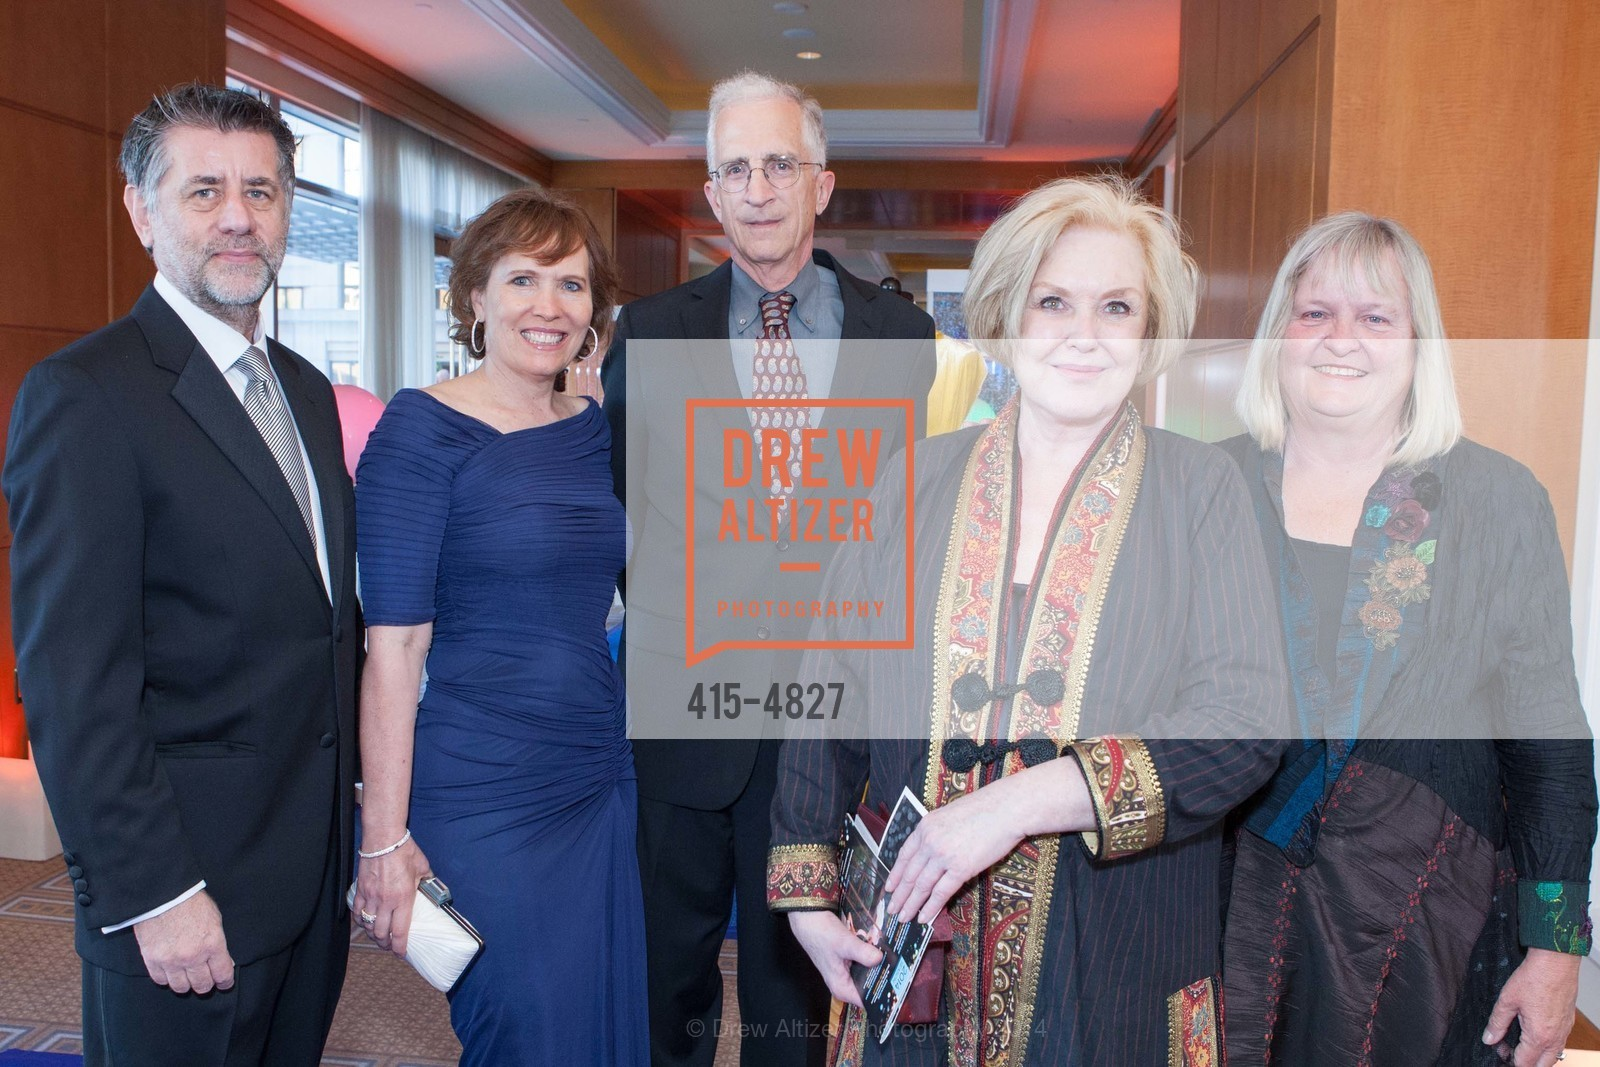 Colin Watson, Janee Pennington-Watson, David Goldsmith, Gayle Enright, Diane Goldsmith, Photo #415-4827